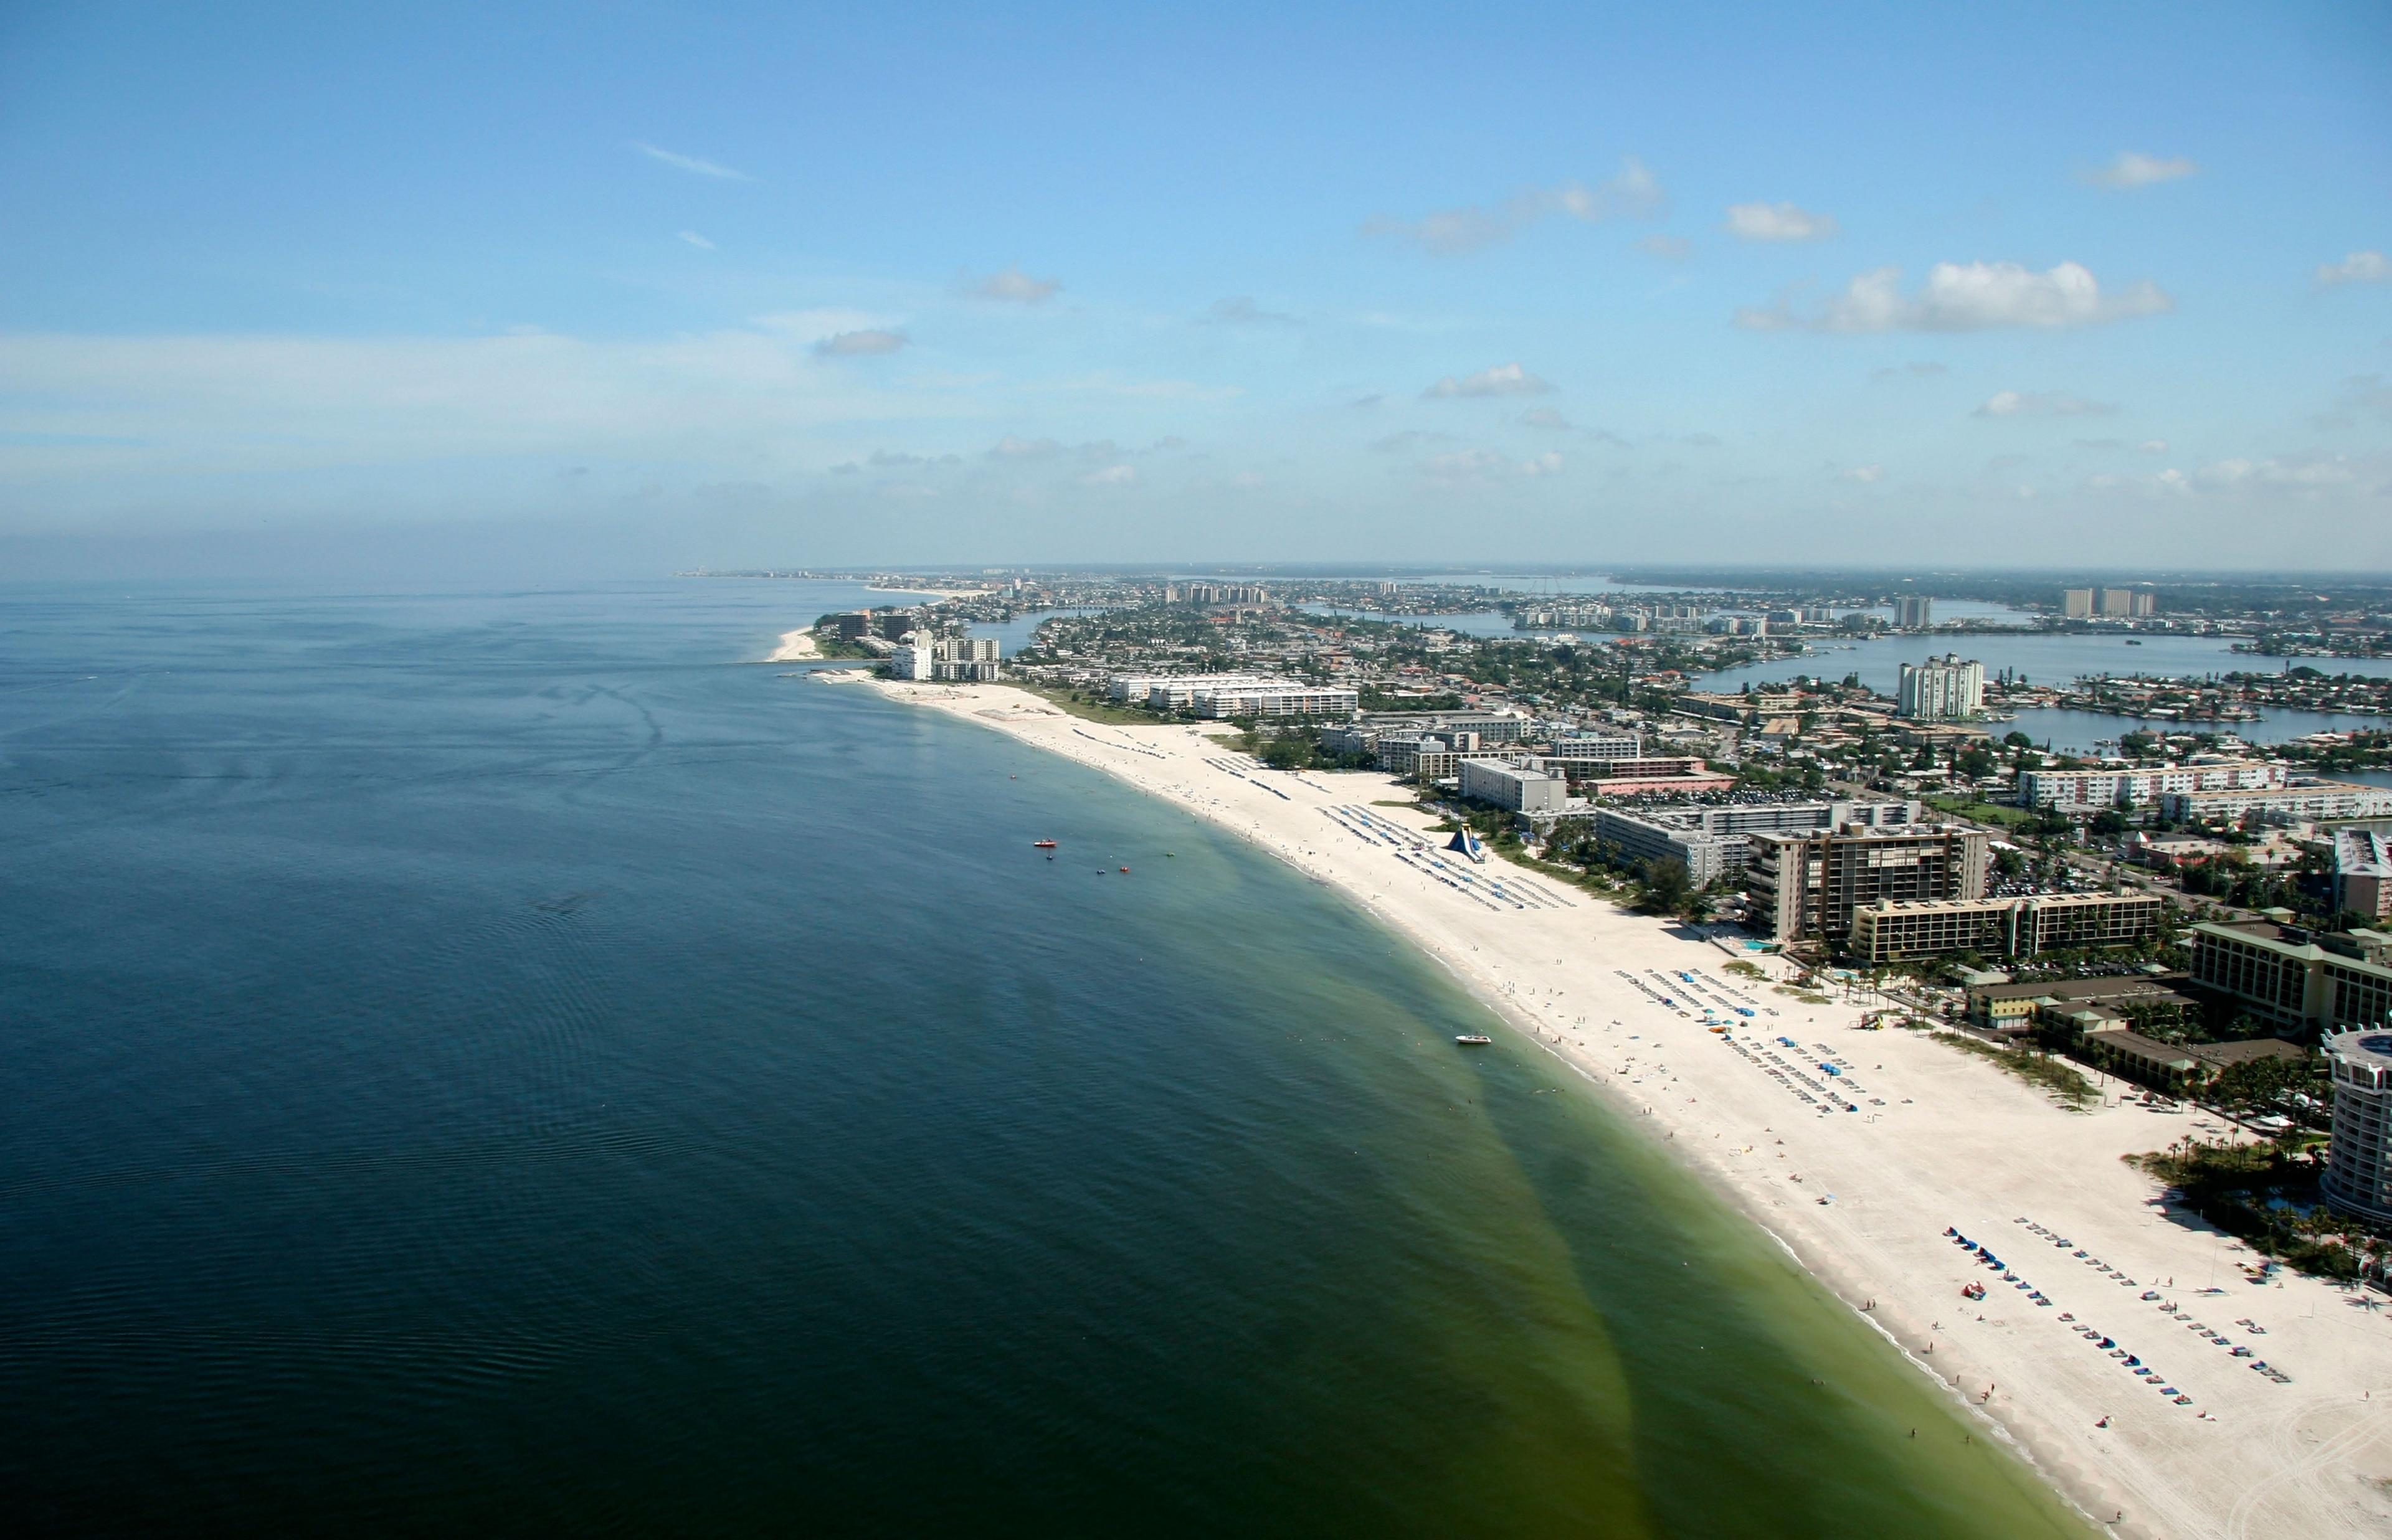 North Redington Beach, Florida, United States of America